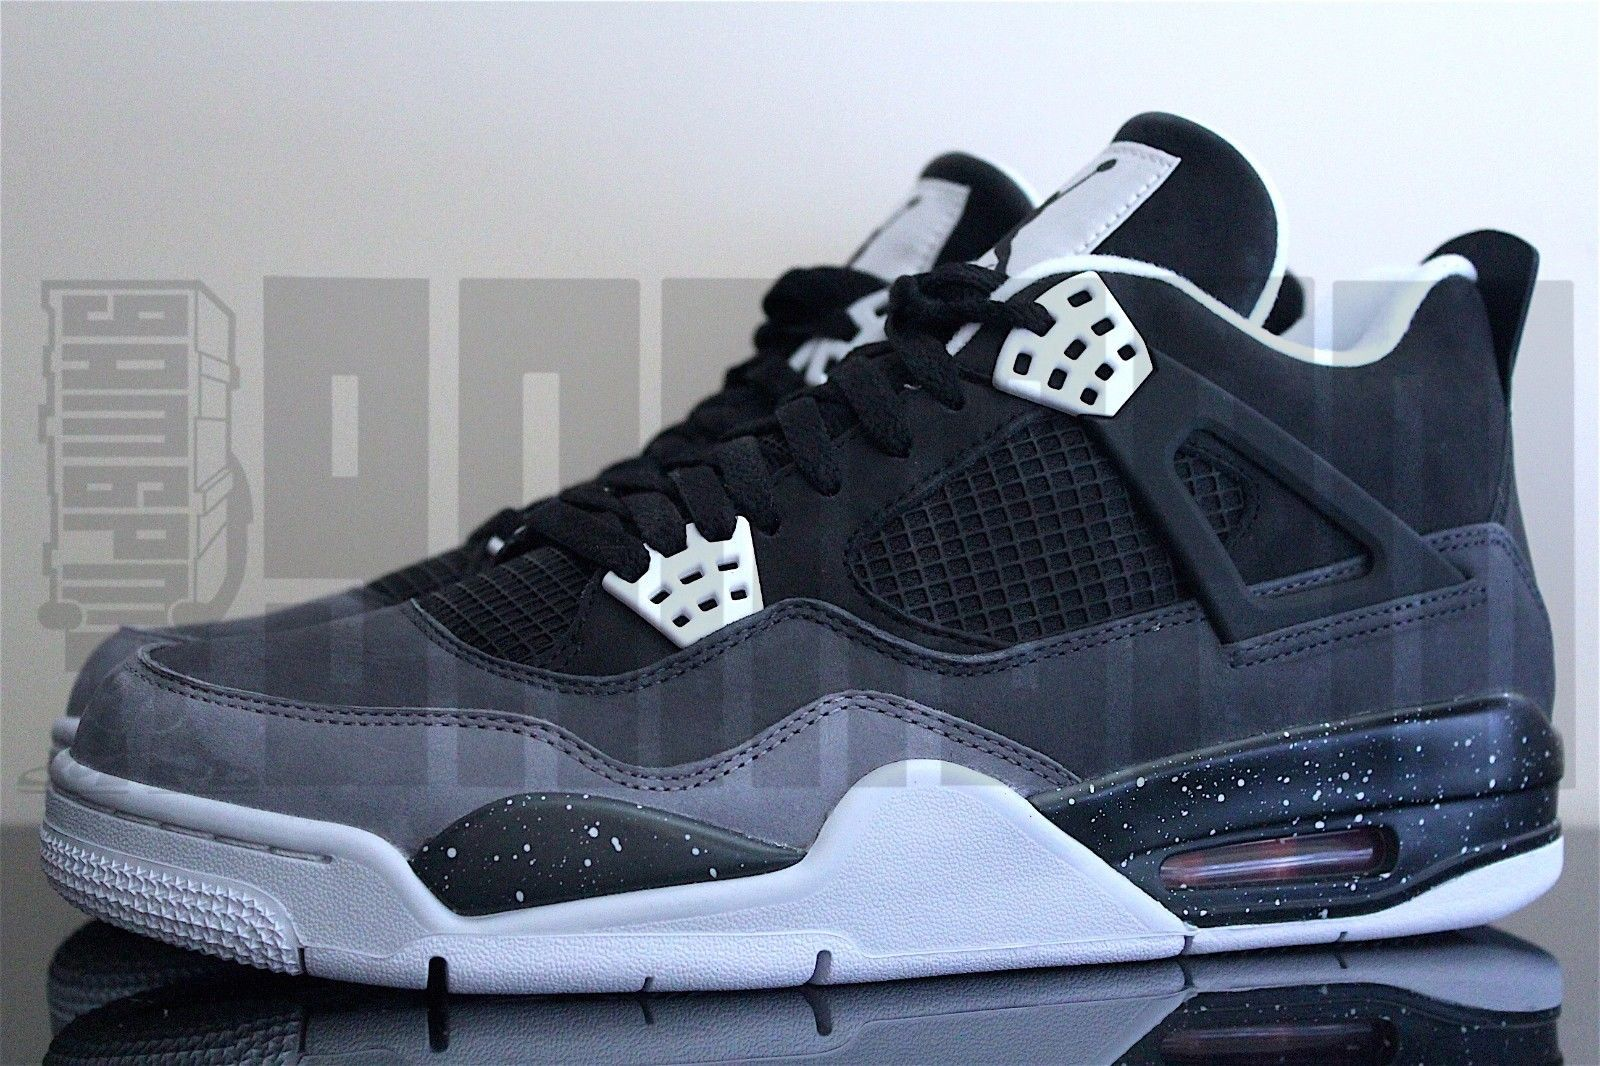 06563a802a50 2013 Nike AIR JORDAN 4 RETRO 7 8 9 10 11 12 FEAR PACK BLACK GREY oreo aj4  oregon